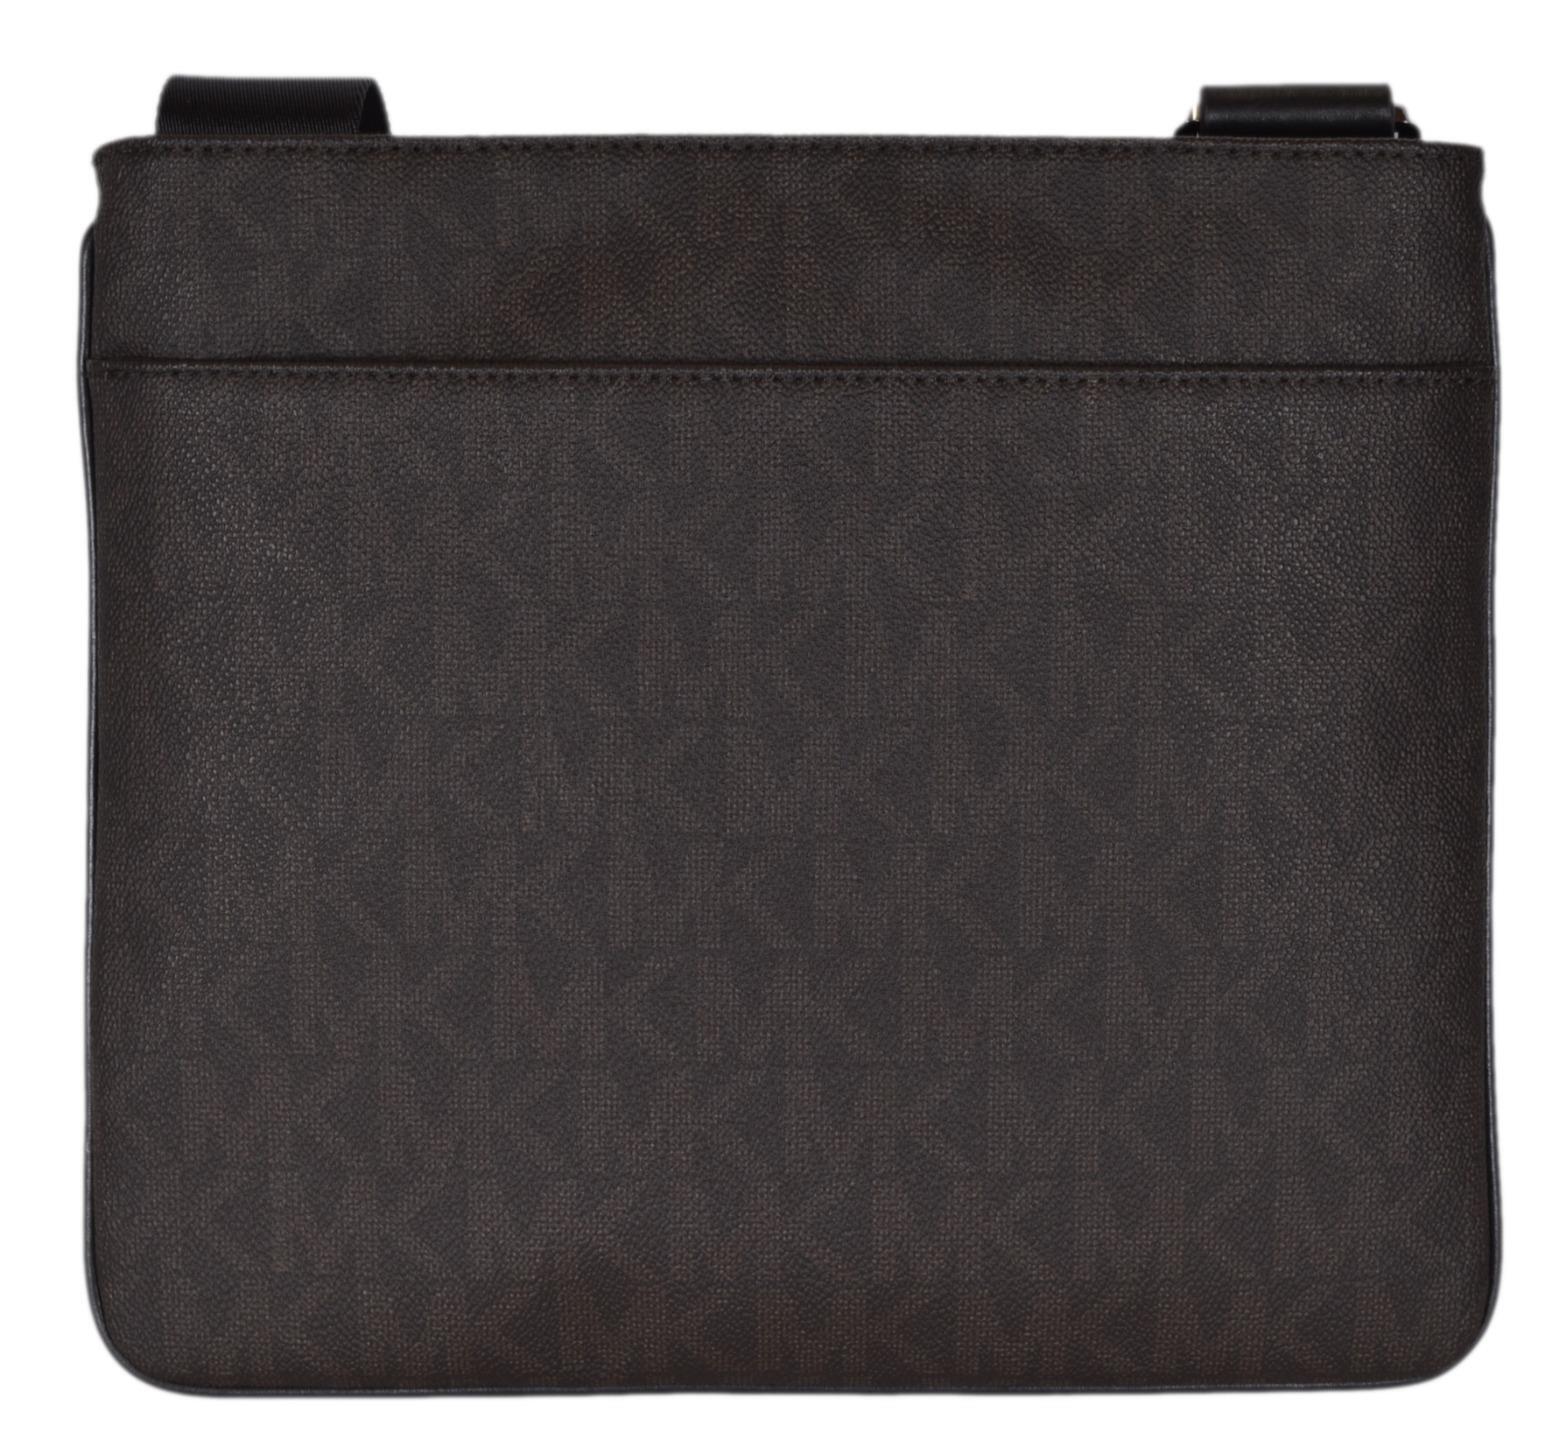 c8a00147eeb2 Michael Kors Men's Coated Canvas Logo Medium Flat Jet Set Messenger Bag for  sale online | eBay